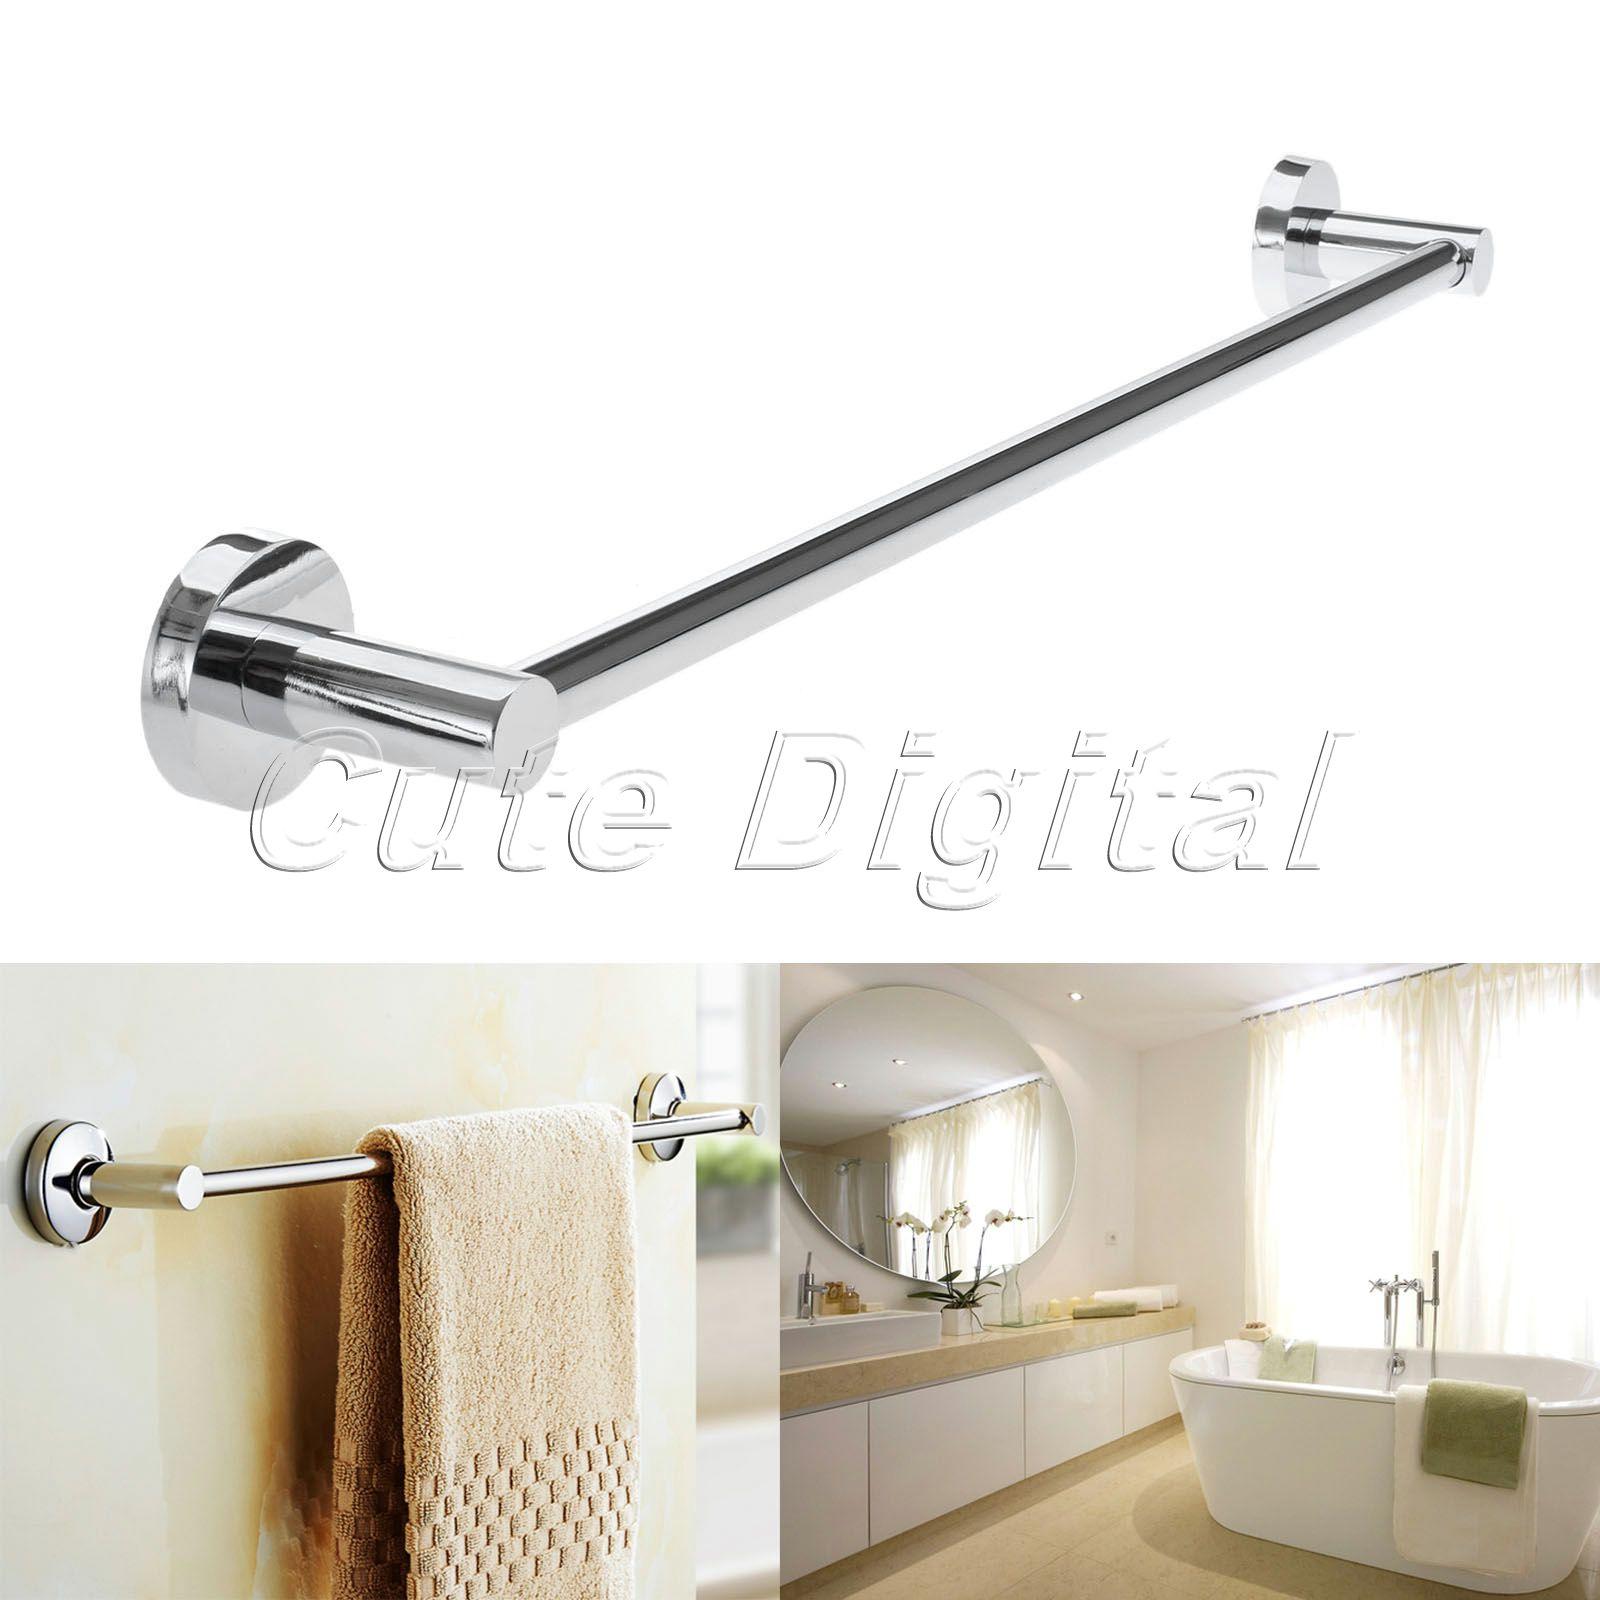 bathroom accessories towel rail | My Web Value